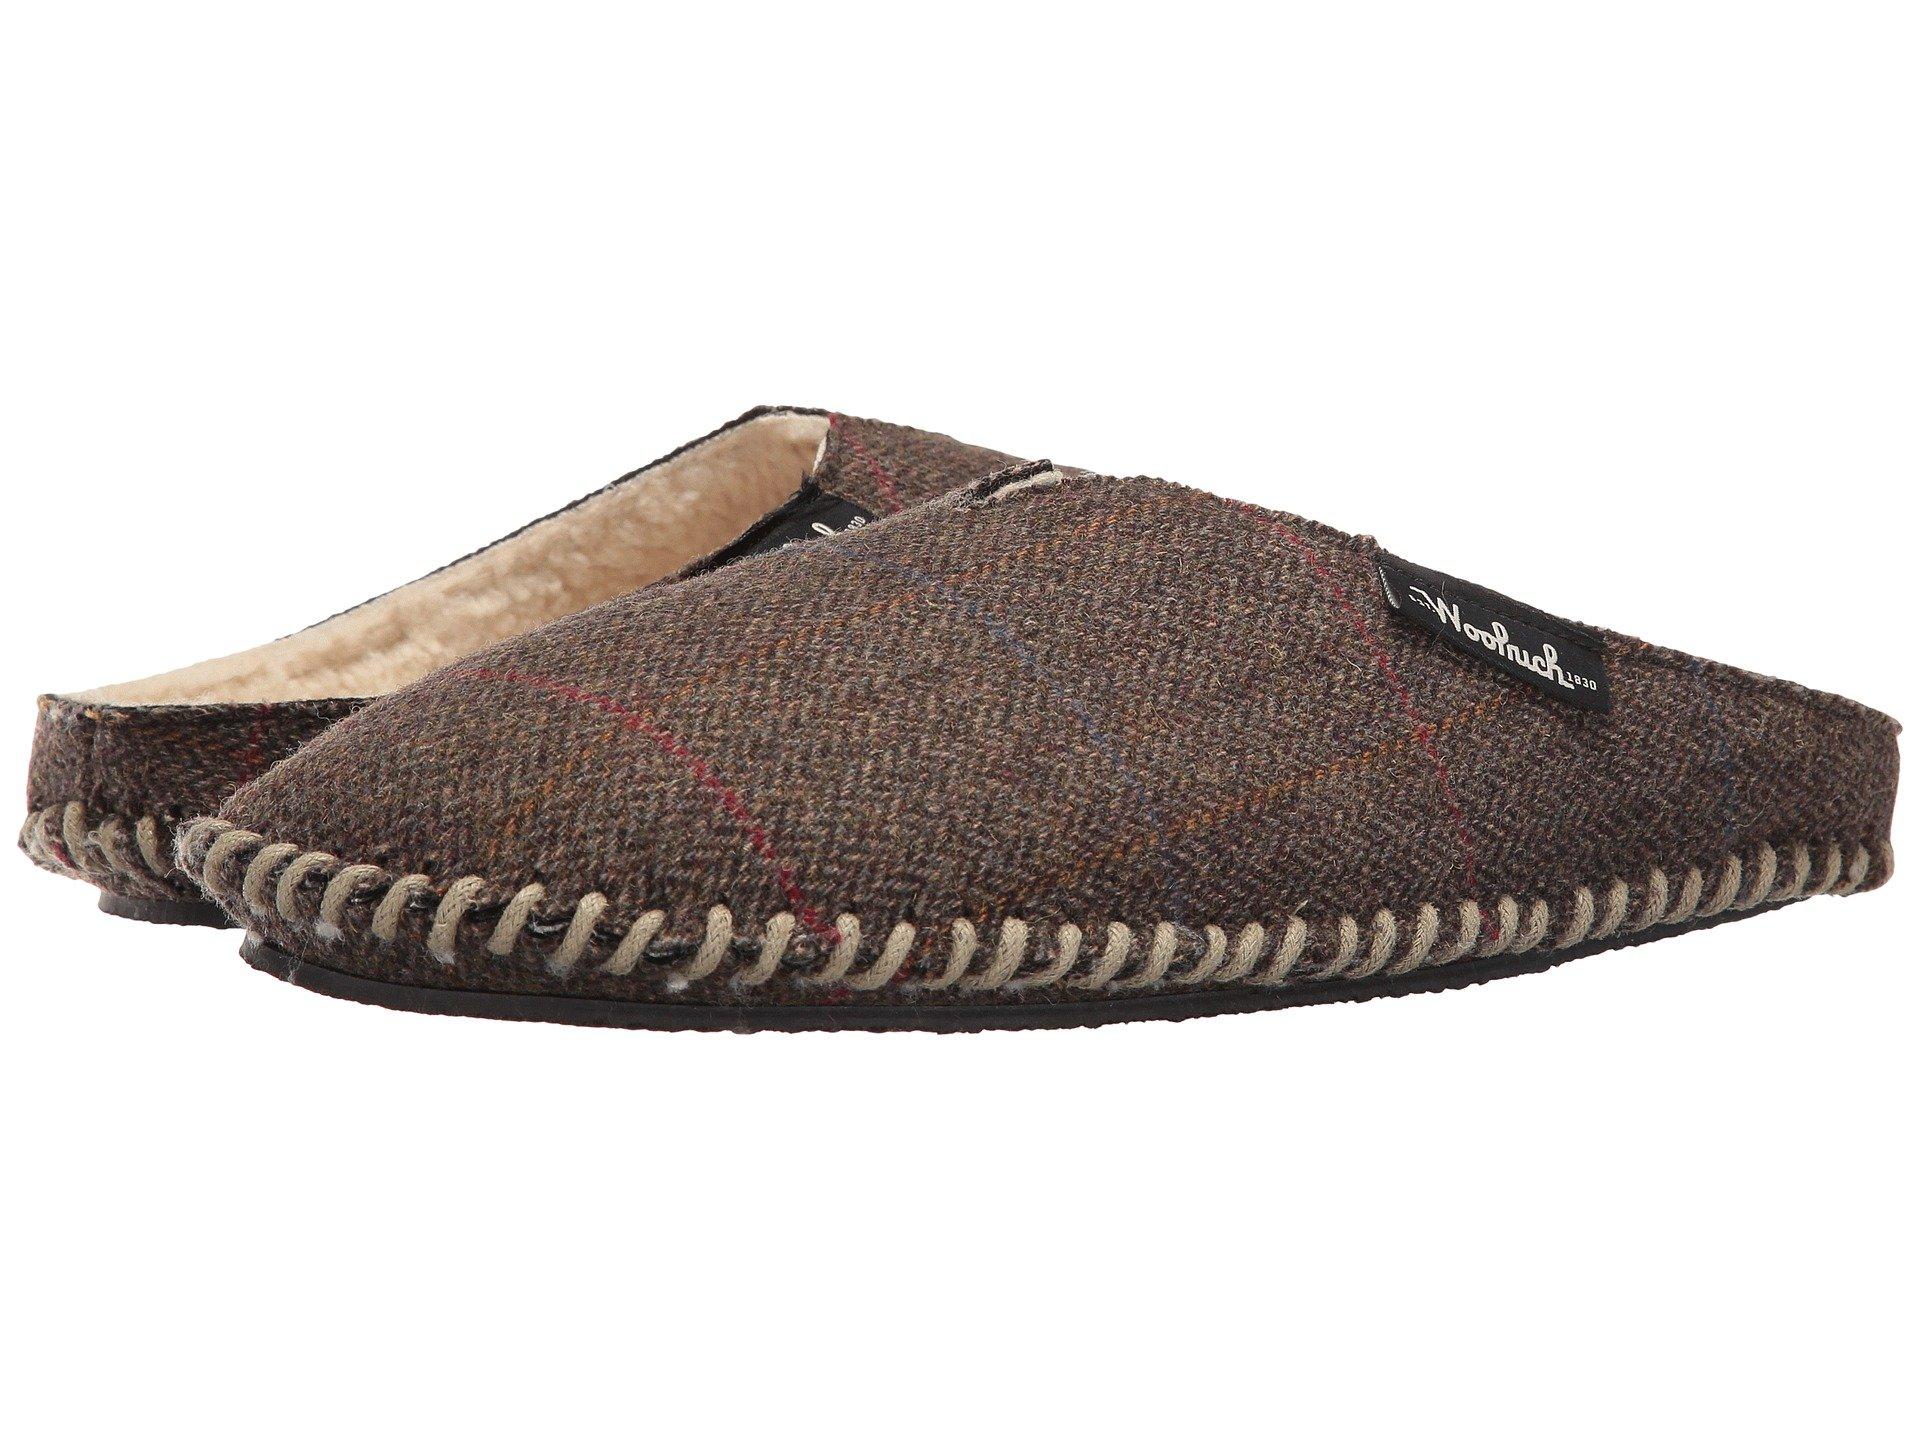 Zapatos de Descanso para Hombre Woolrich Wool Mill Scuff  + Woolrich en VeoyCompro.net